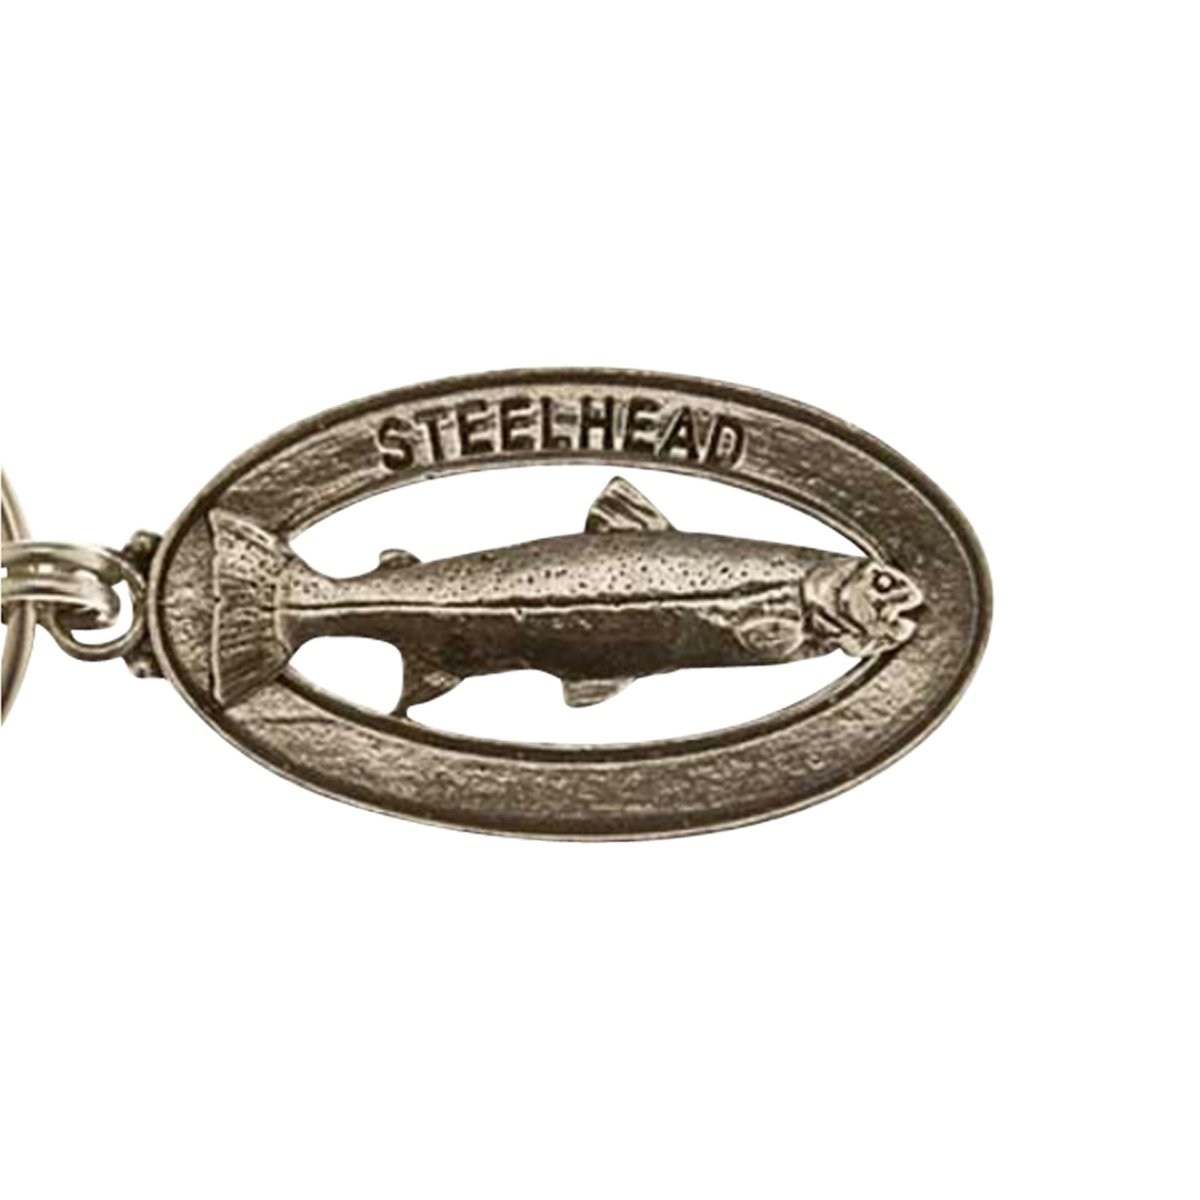 Creative Pewter Designs, Pewter Steelhead Key Chain, Antiqued Finish, FK034